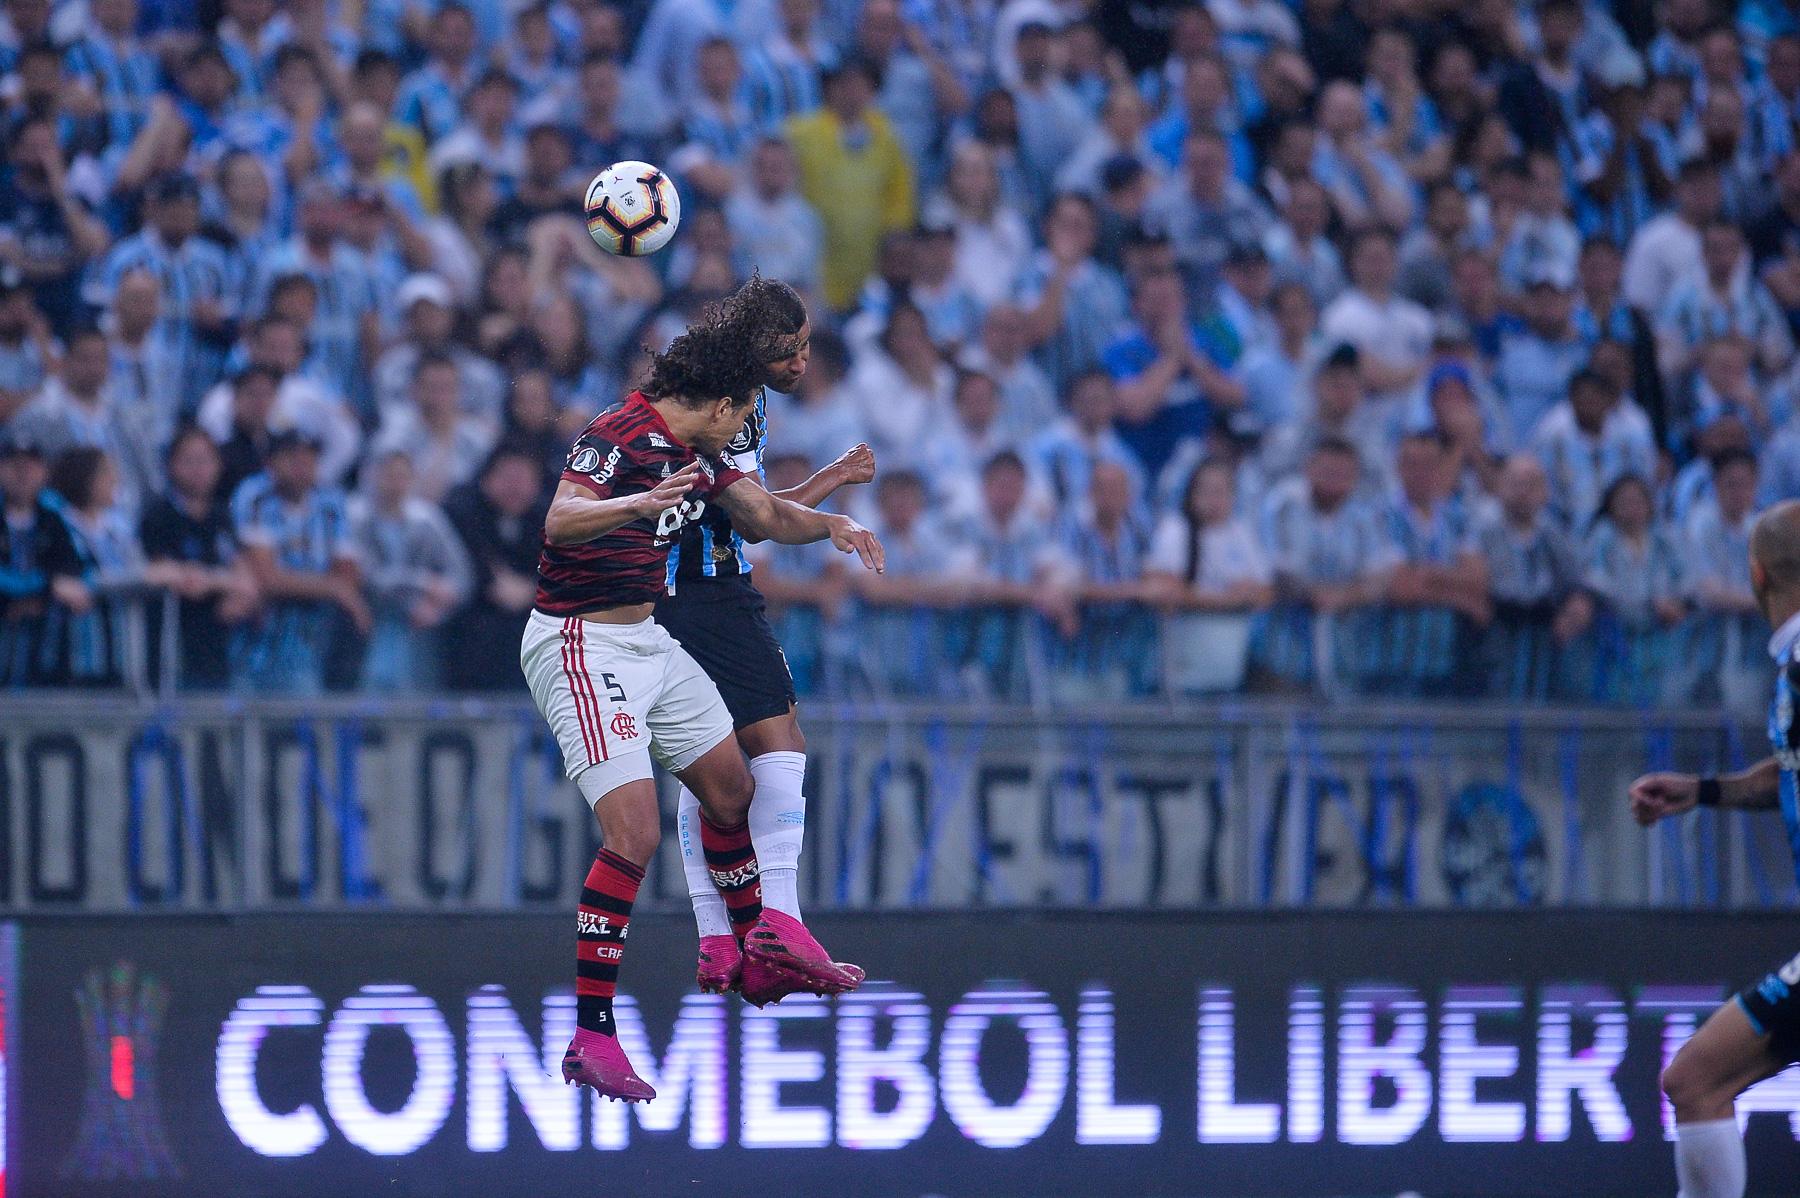 Gremio_X_Flamengo_dudabairros_Eleven_126